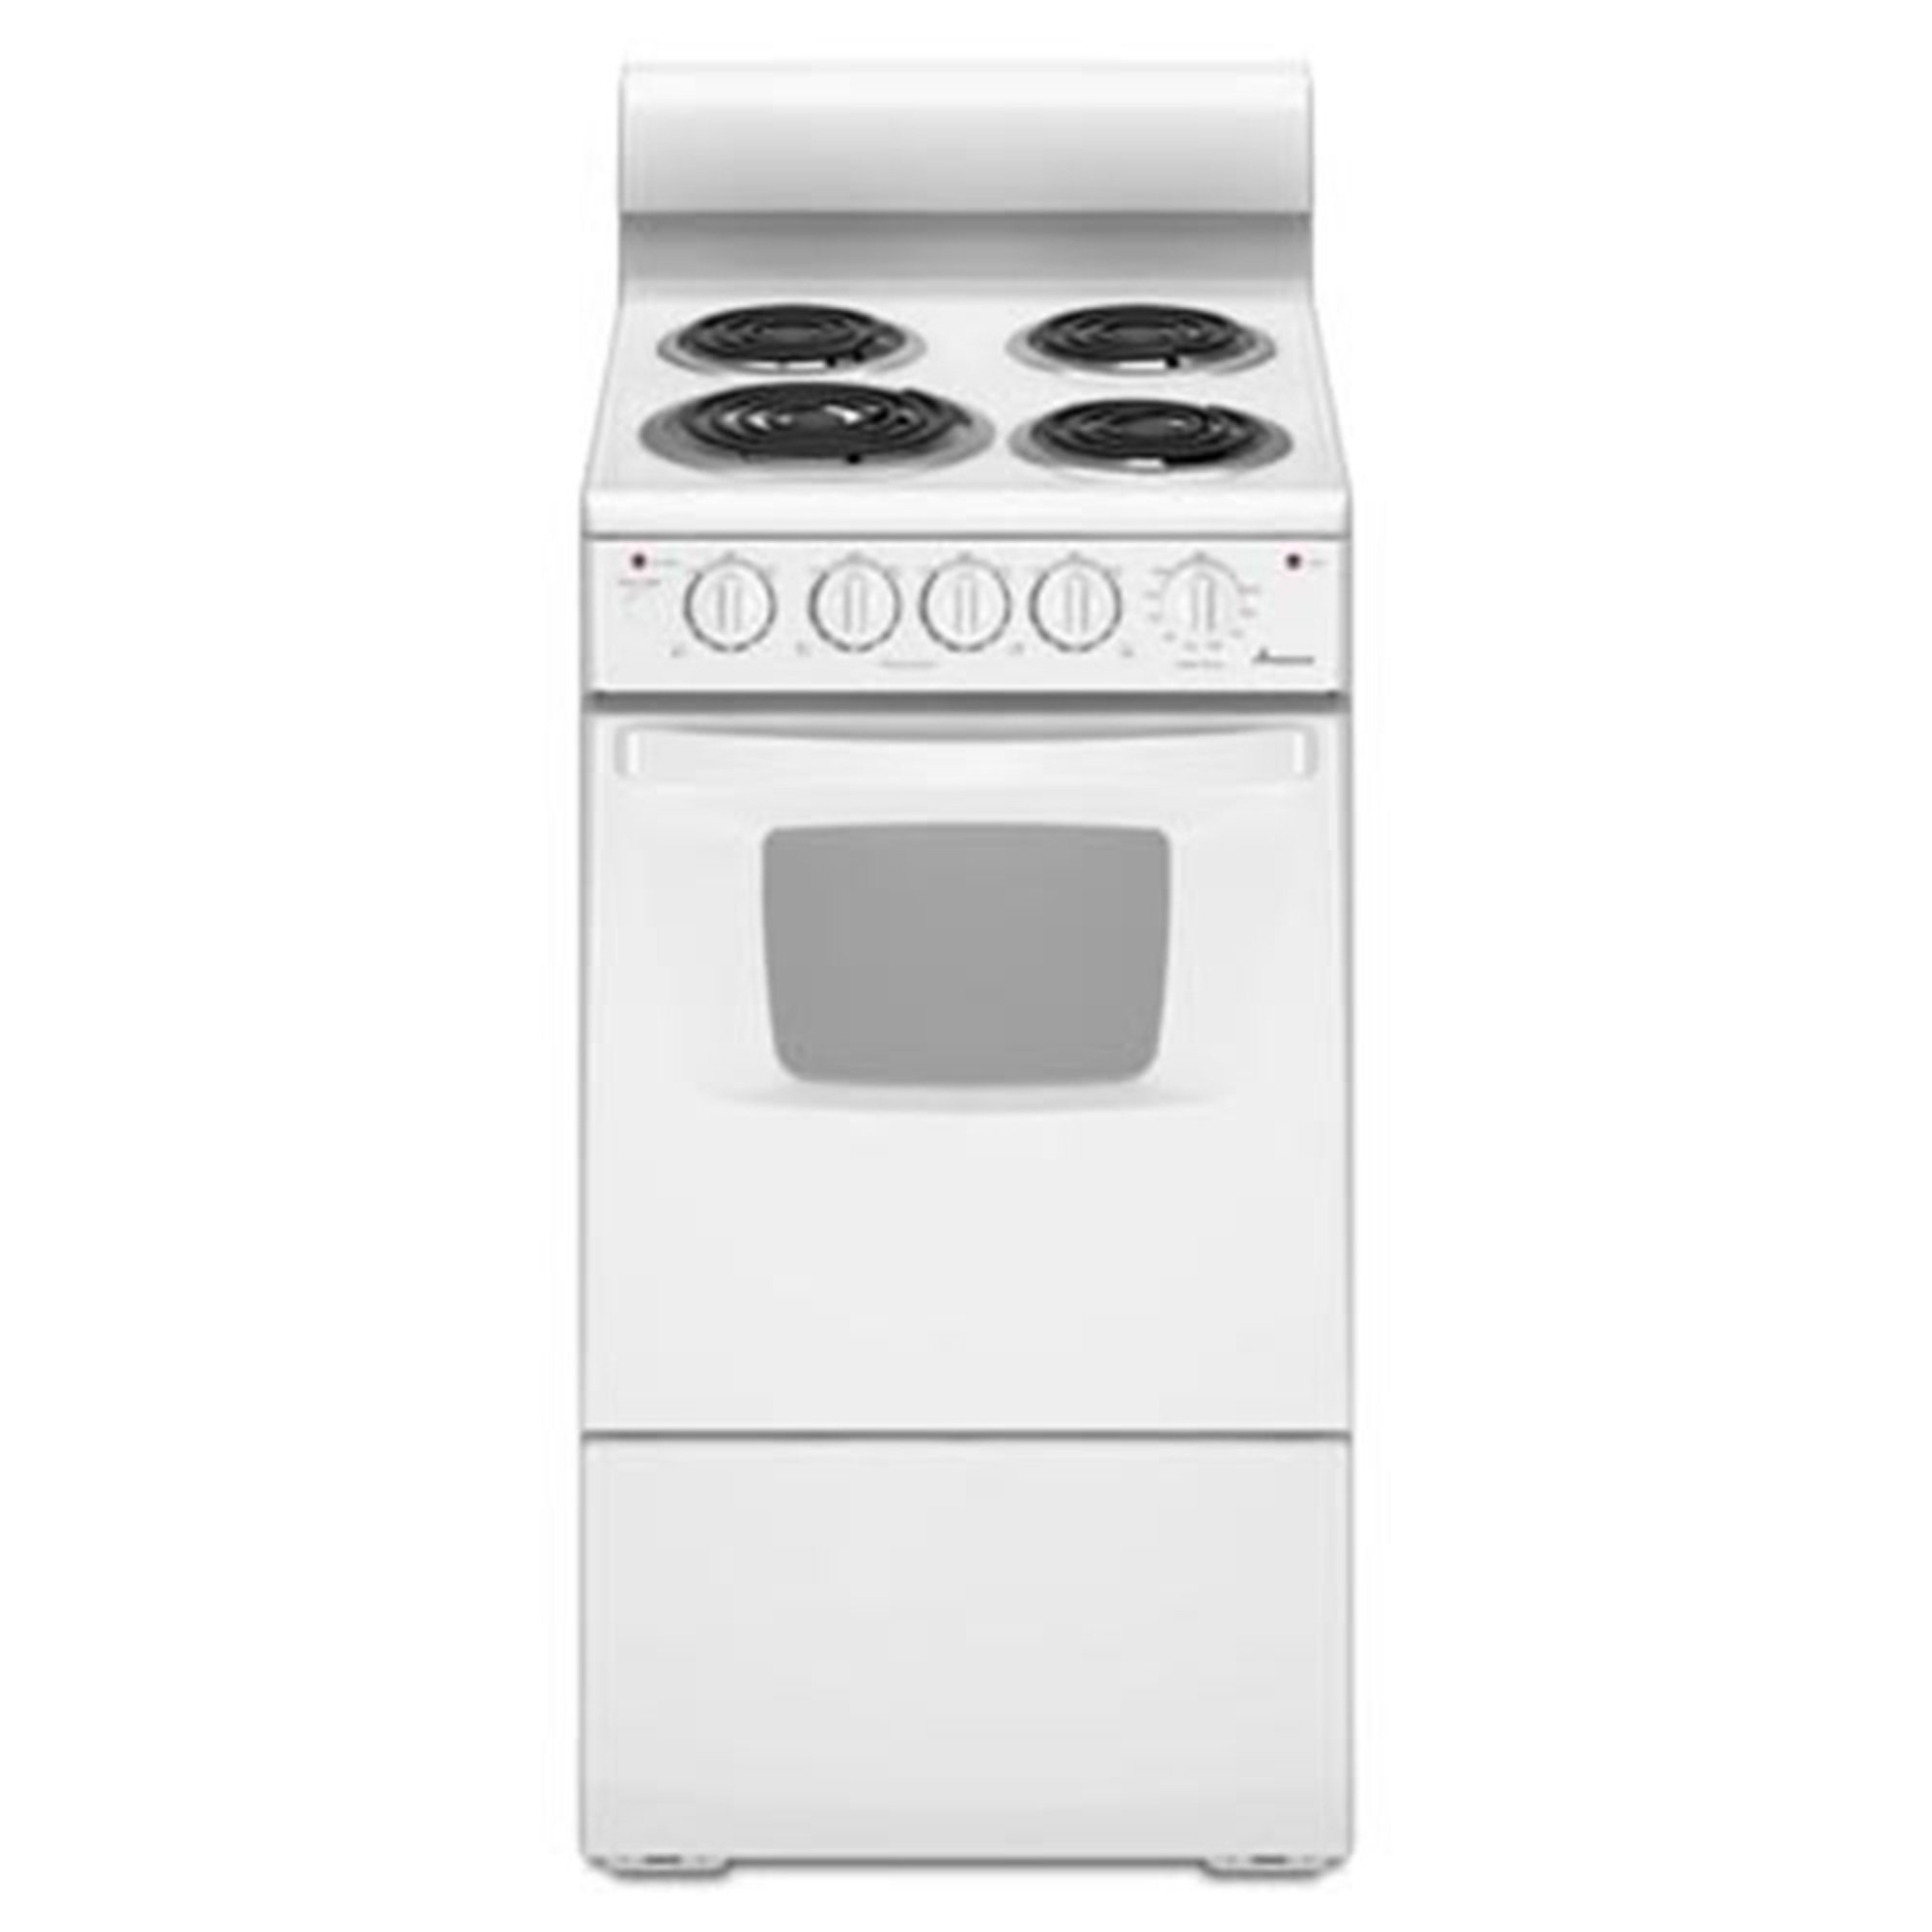 "Amana 20"" Electric Range Oven W/ Versatile Cooktop, White"